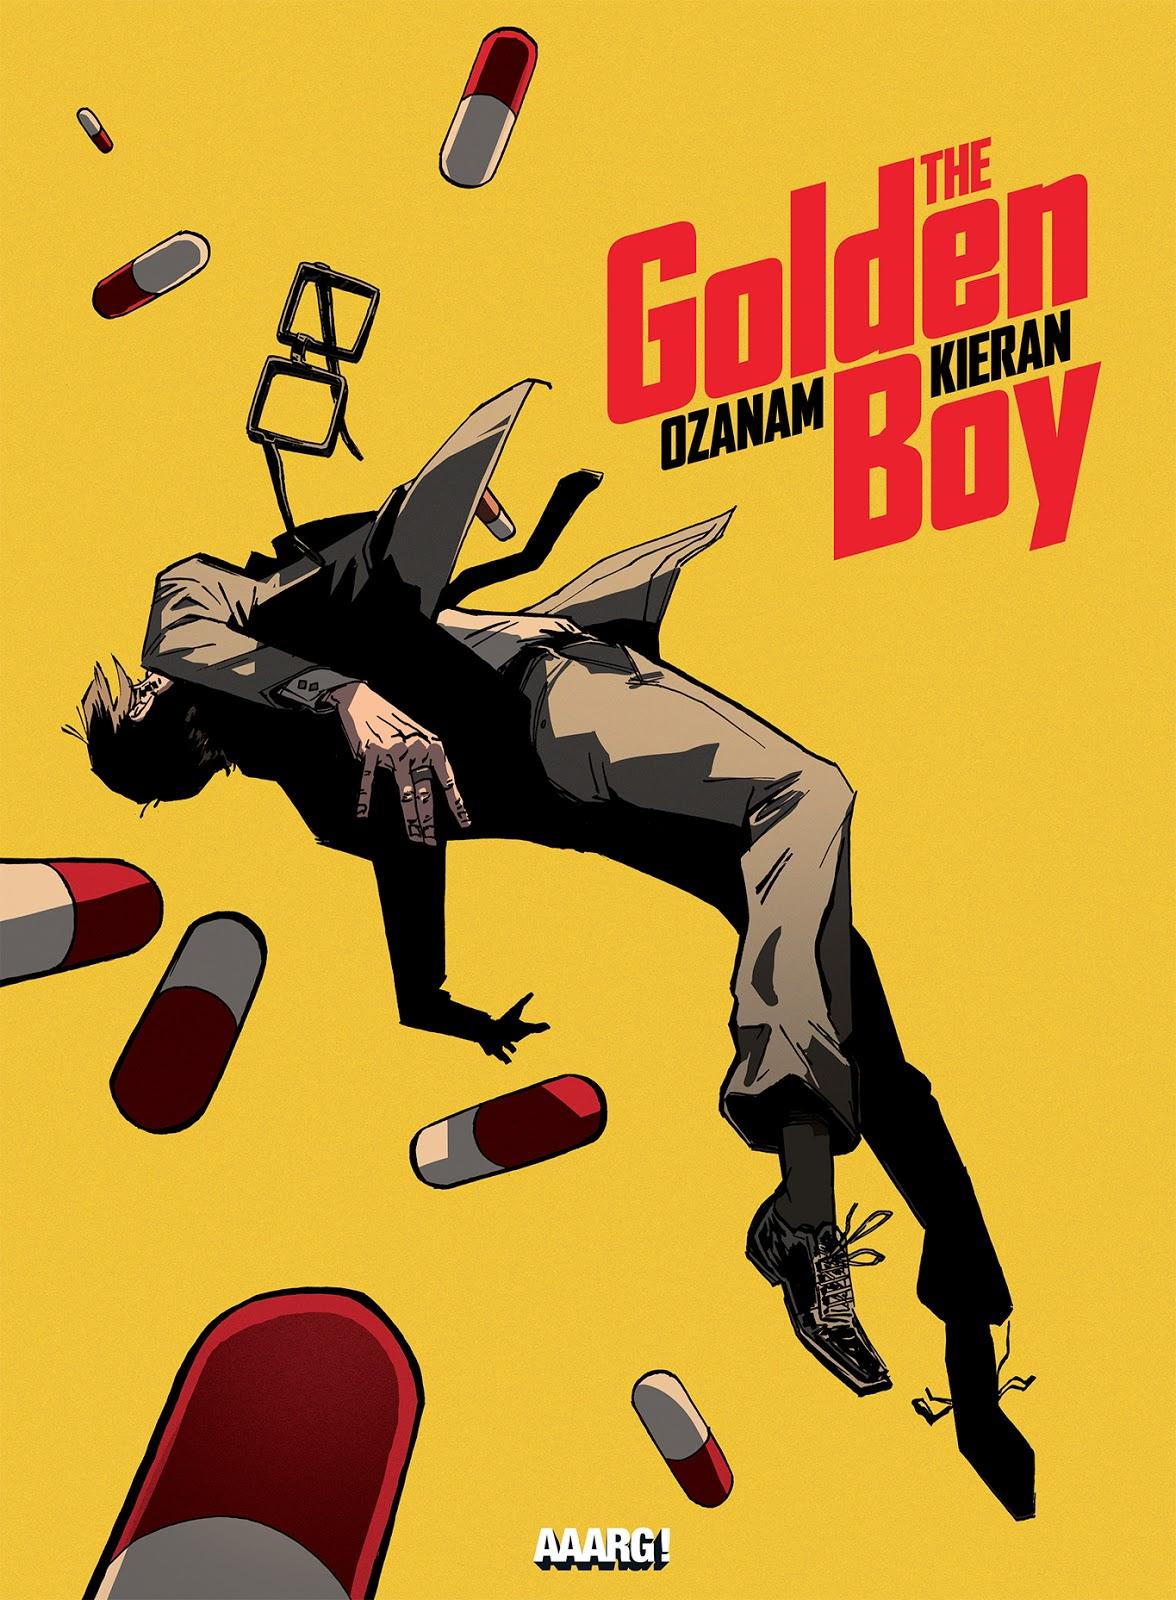 Golden Boy - Ozanam -Kieran - Aaarg! - Couverture